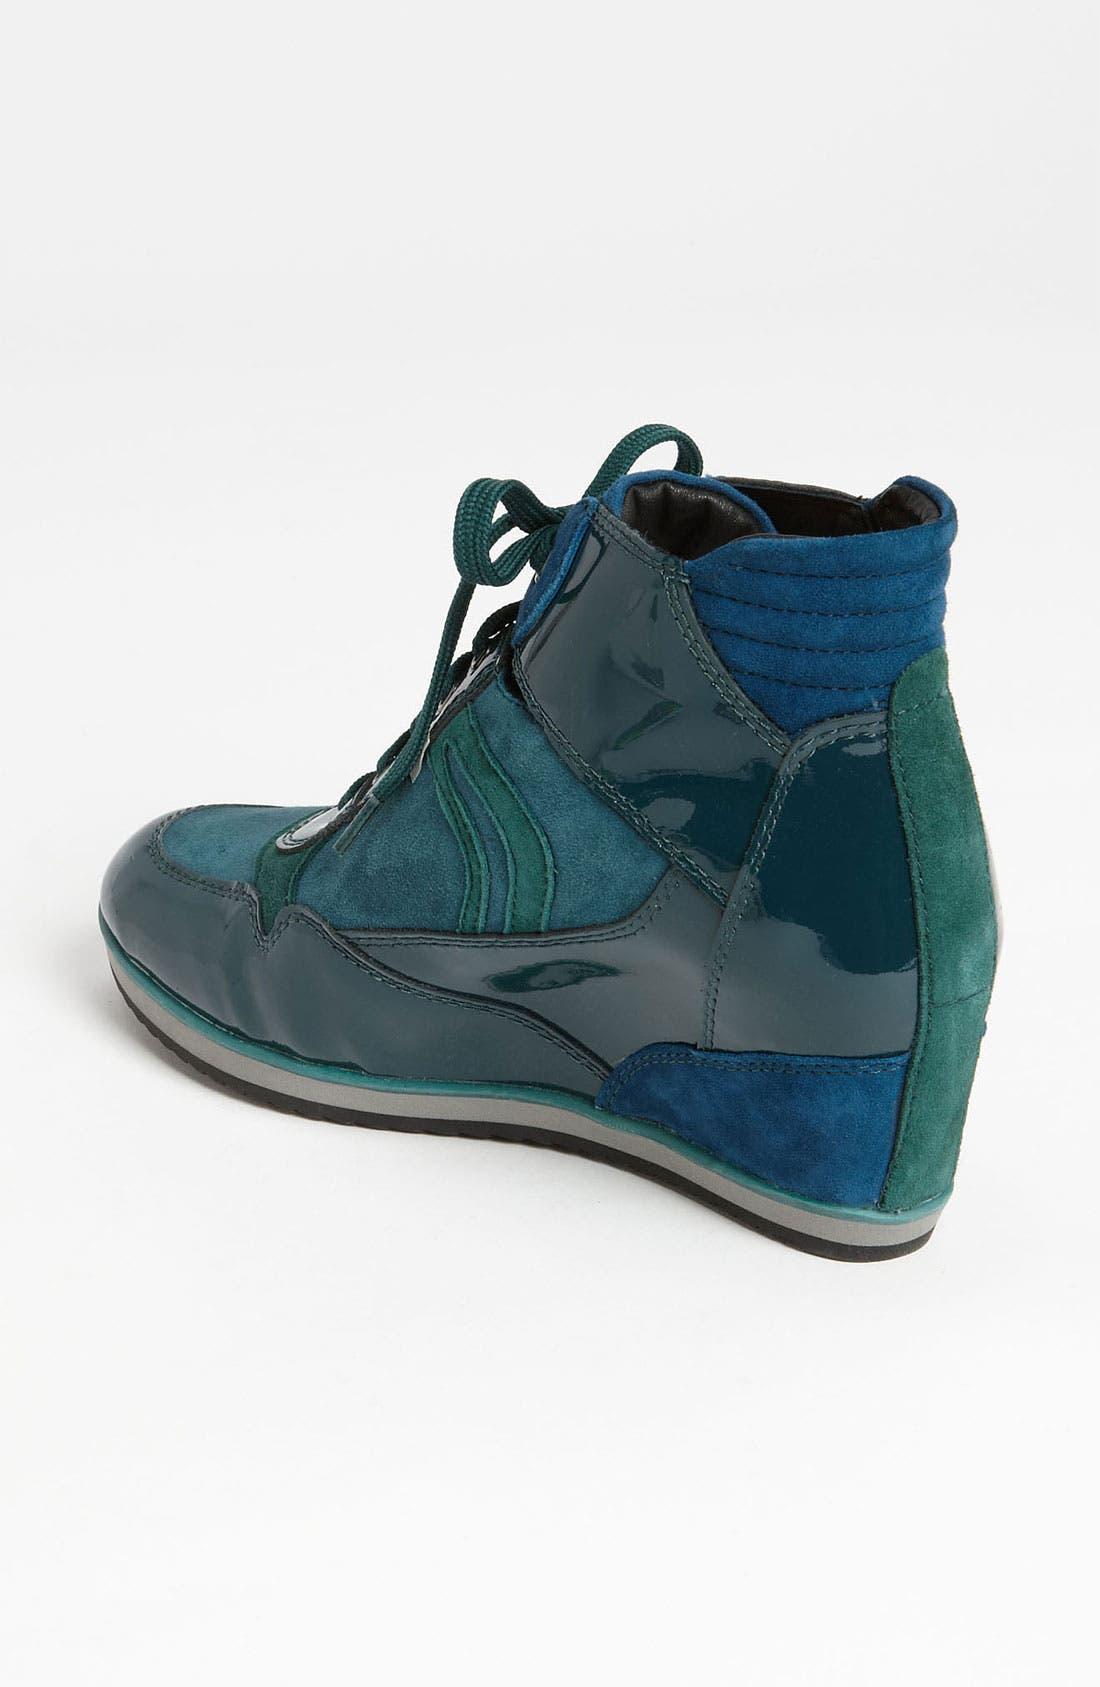 Alternate Image 2  - Geox 'D Illusion' High Top Wedge Sneaker